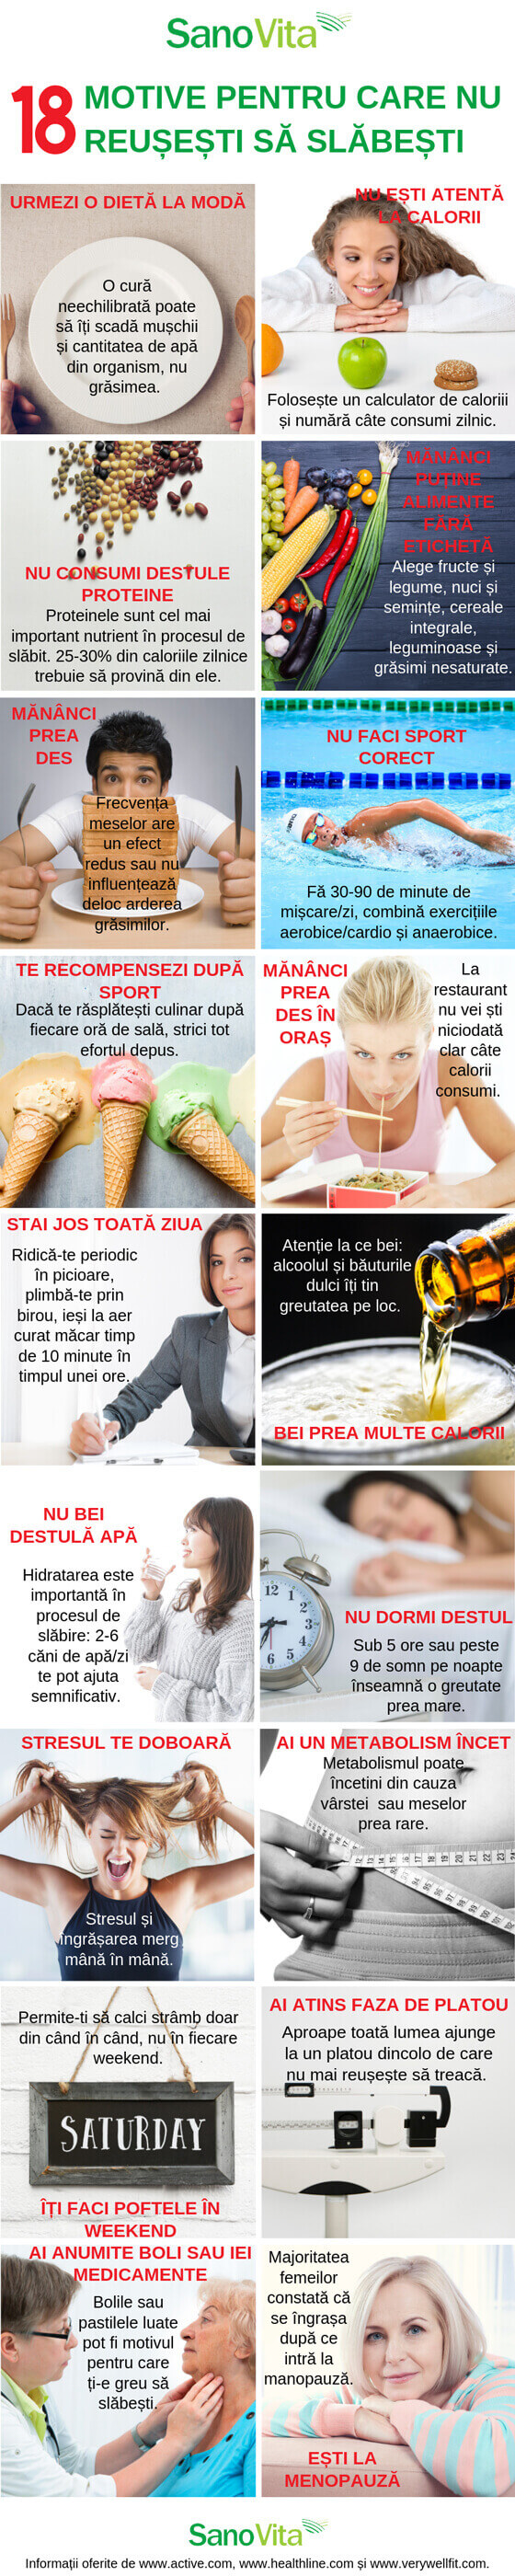 pierde in greutate nu mananca zahar